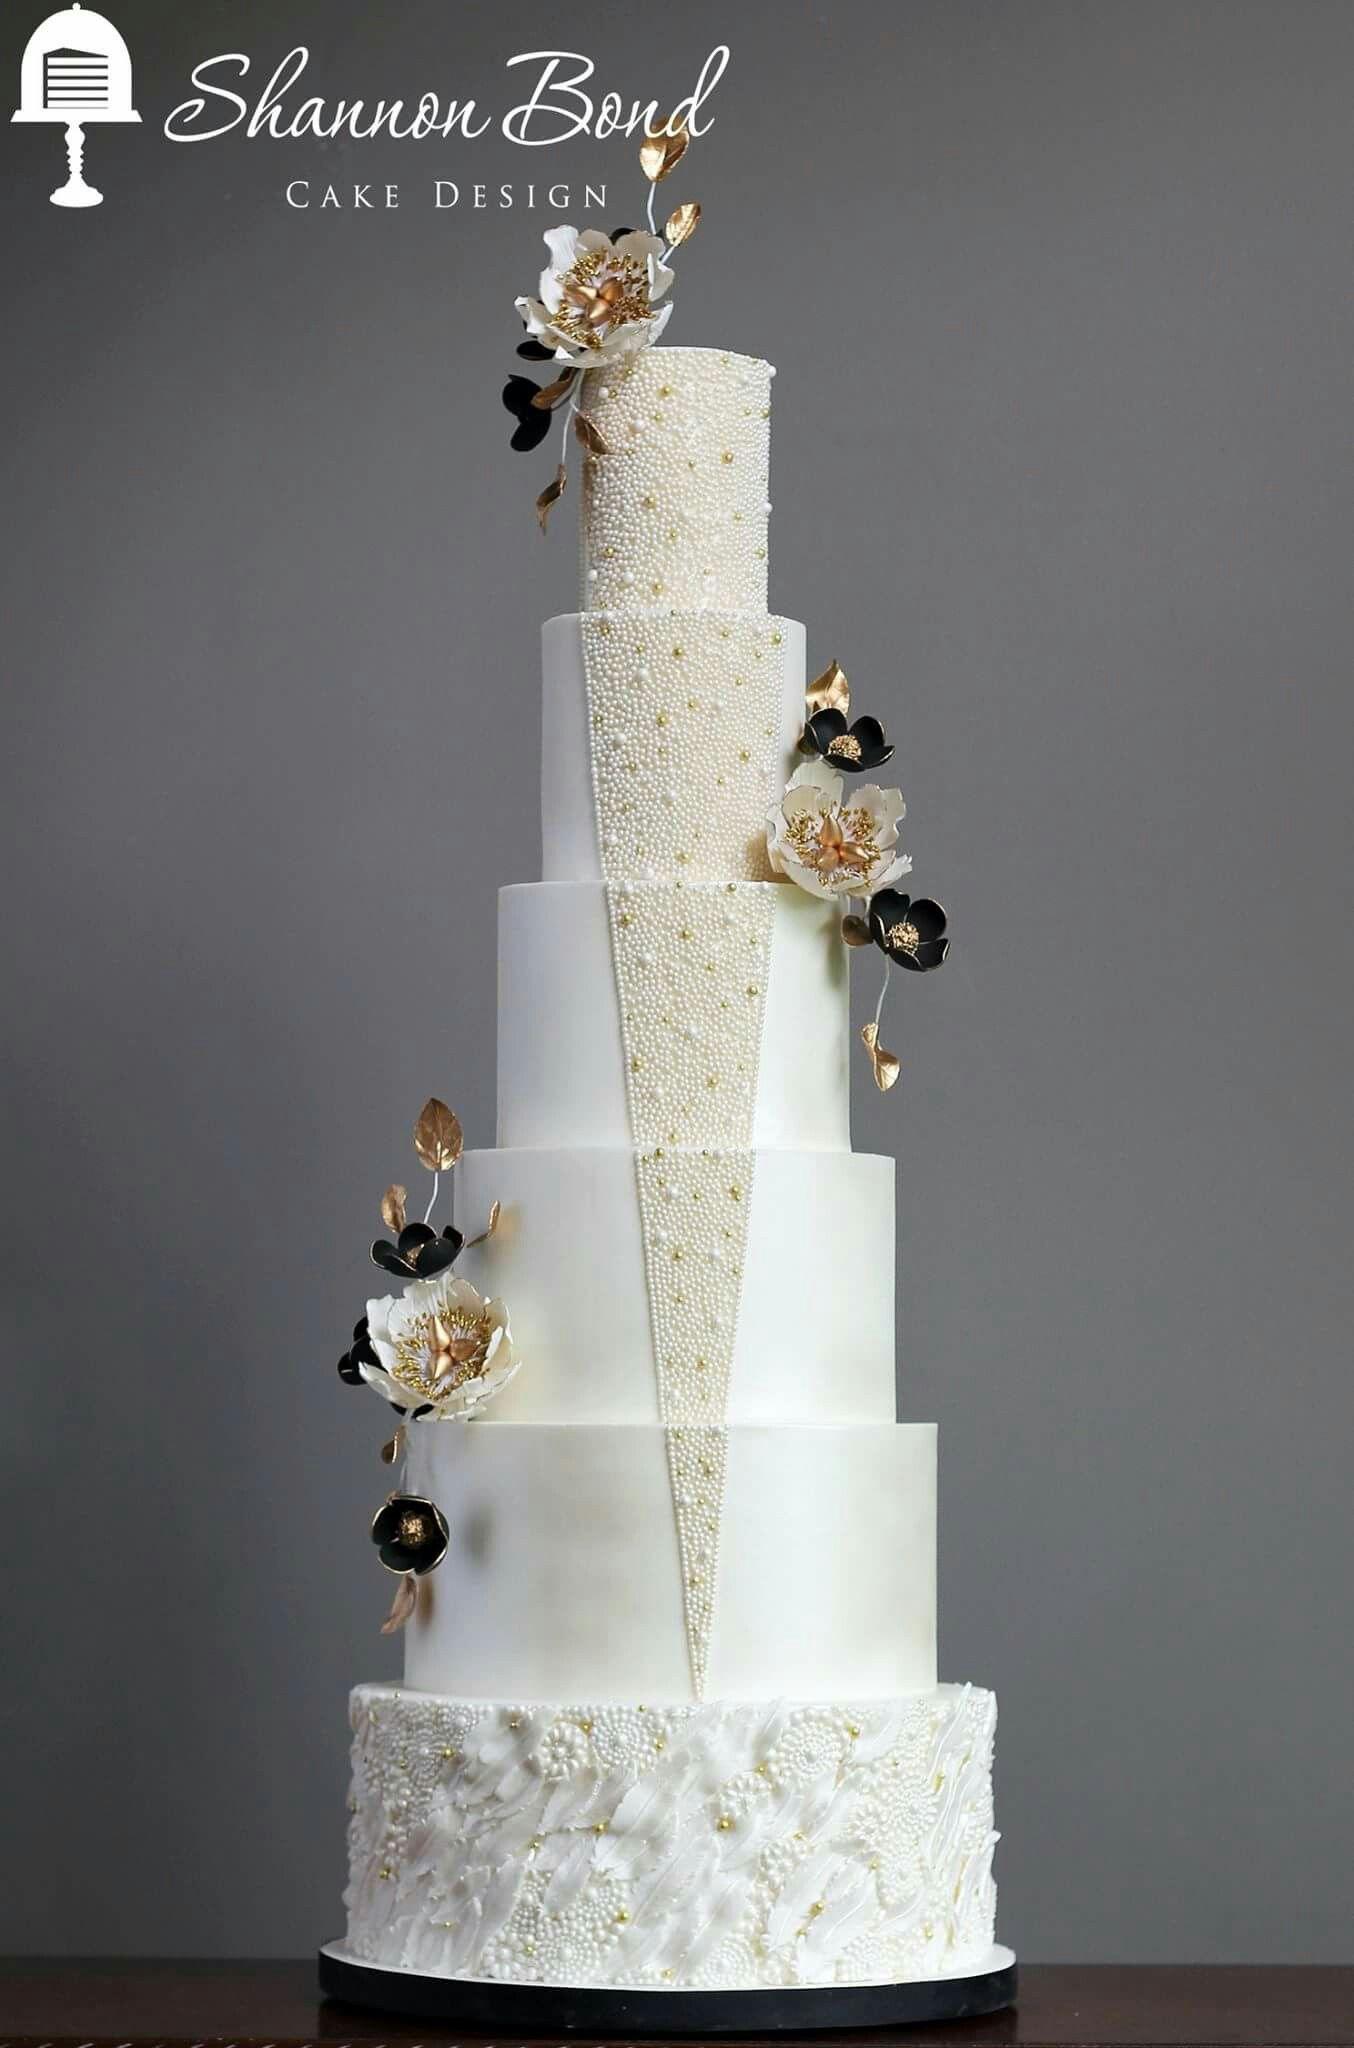 Pin by eva korpova on cakes pinterest tiered cakes and cake